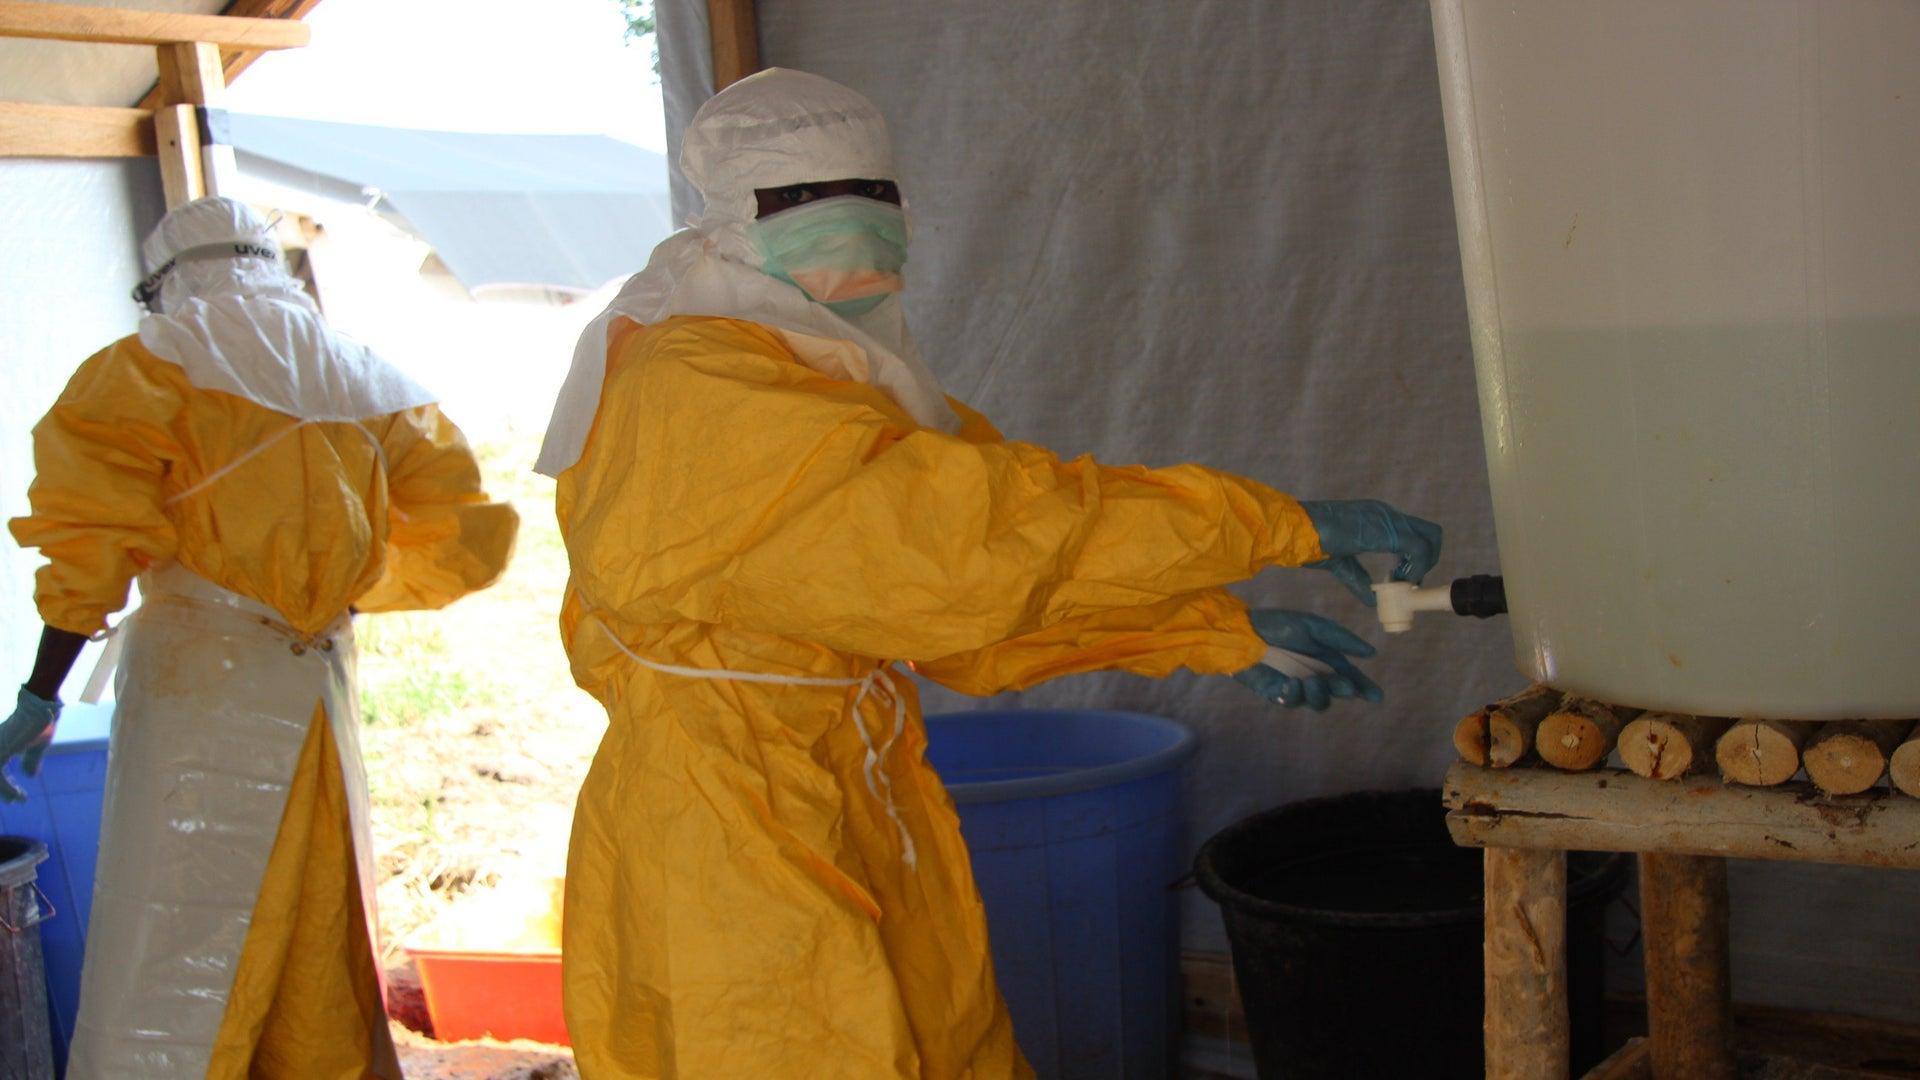 Officials Confirm Second Case Of Ebola In Congo Outbreak